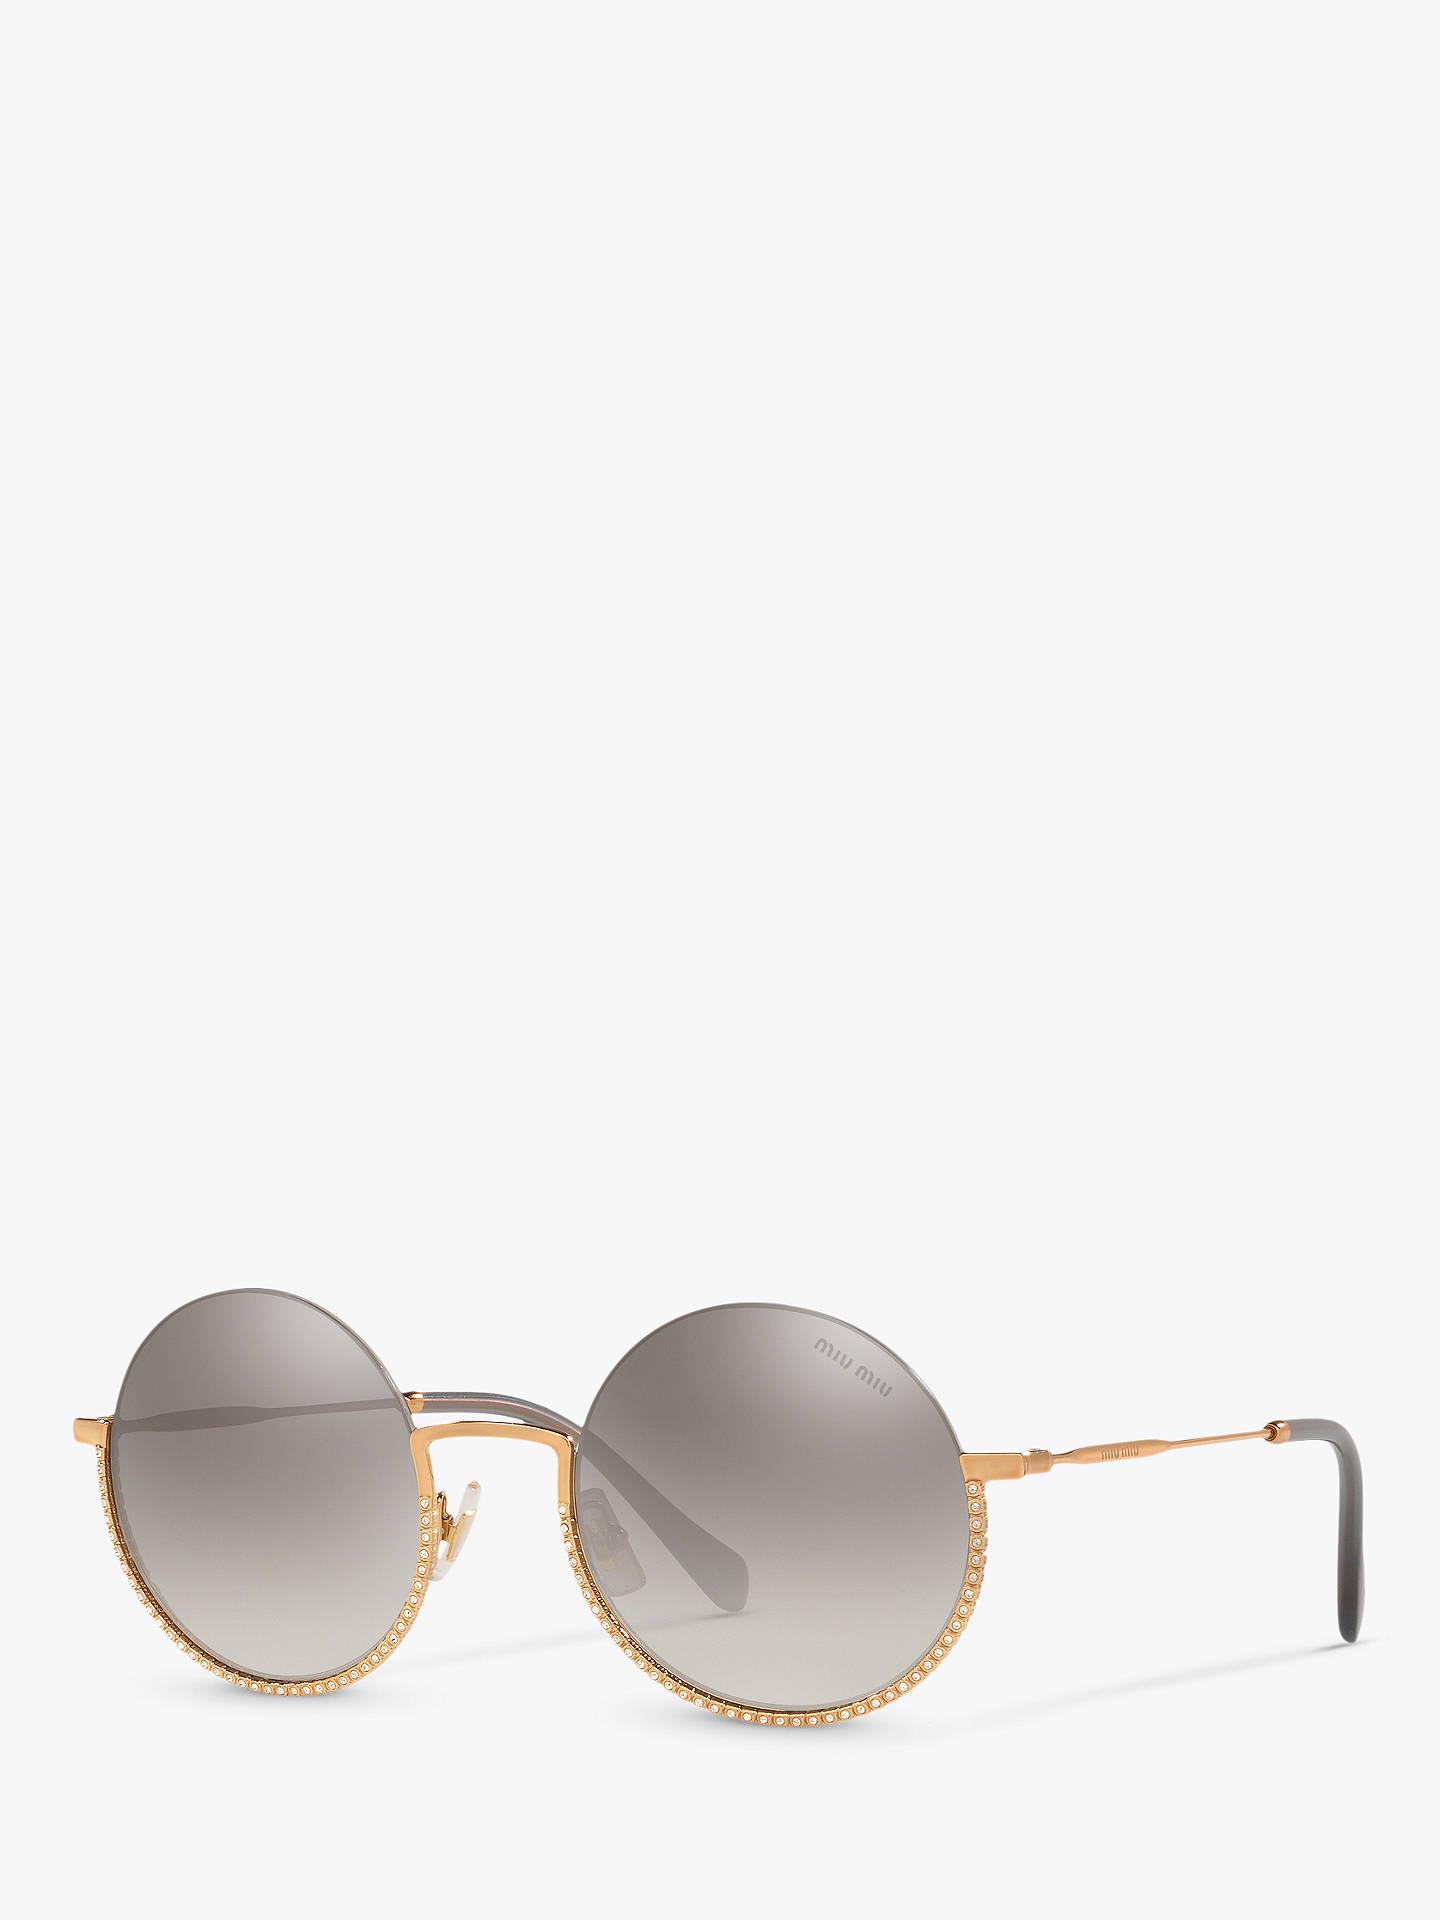 miu-miu-mu-69us-womens-embellished-round-sunglasses,-gold_grey by miu-miu